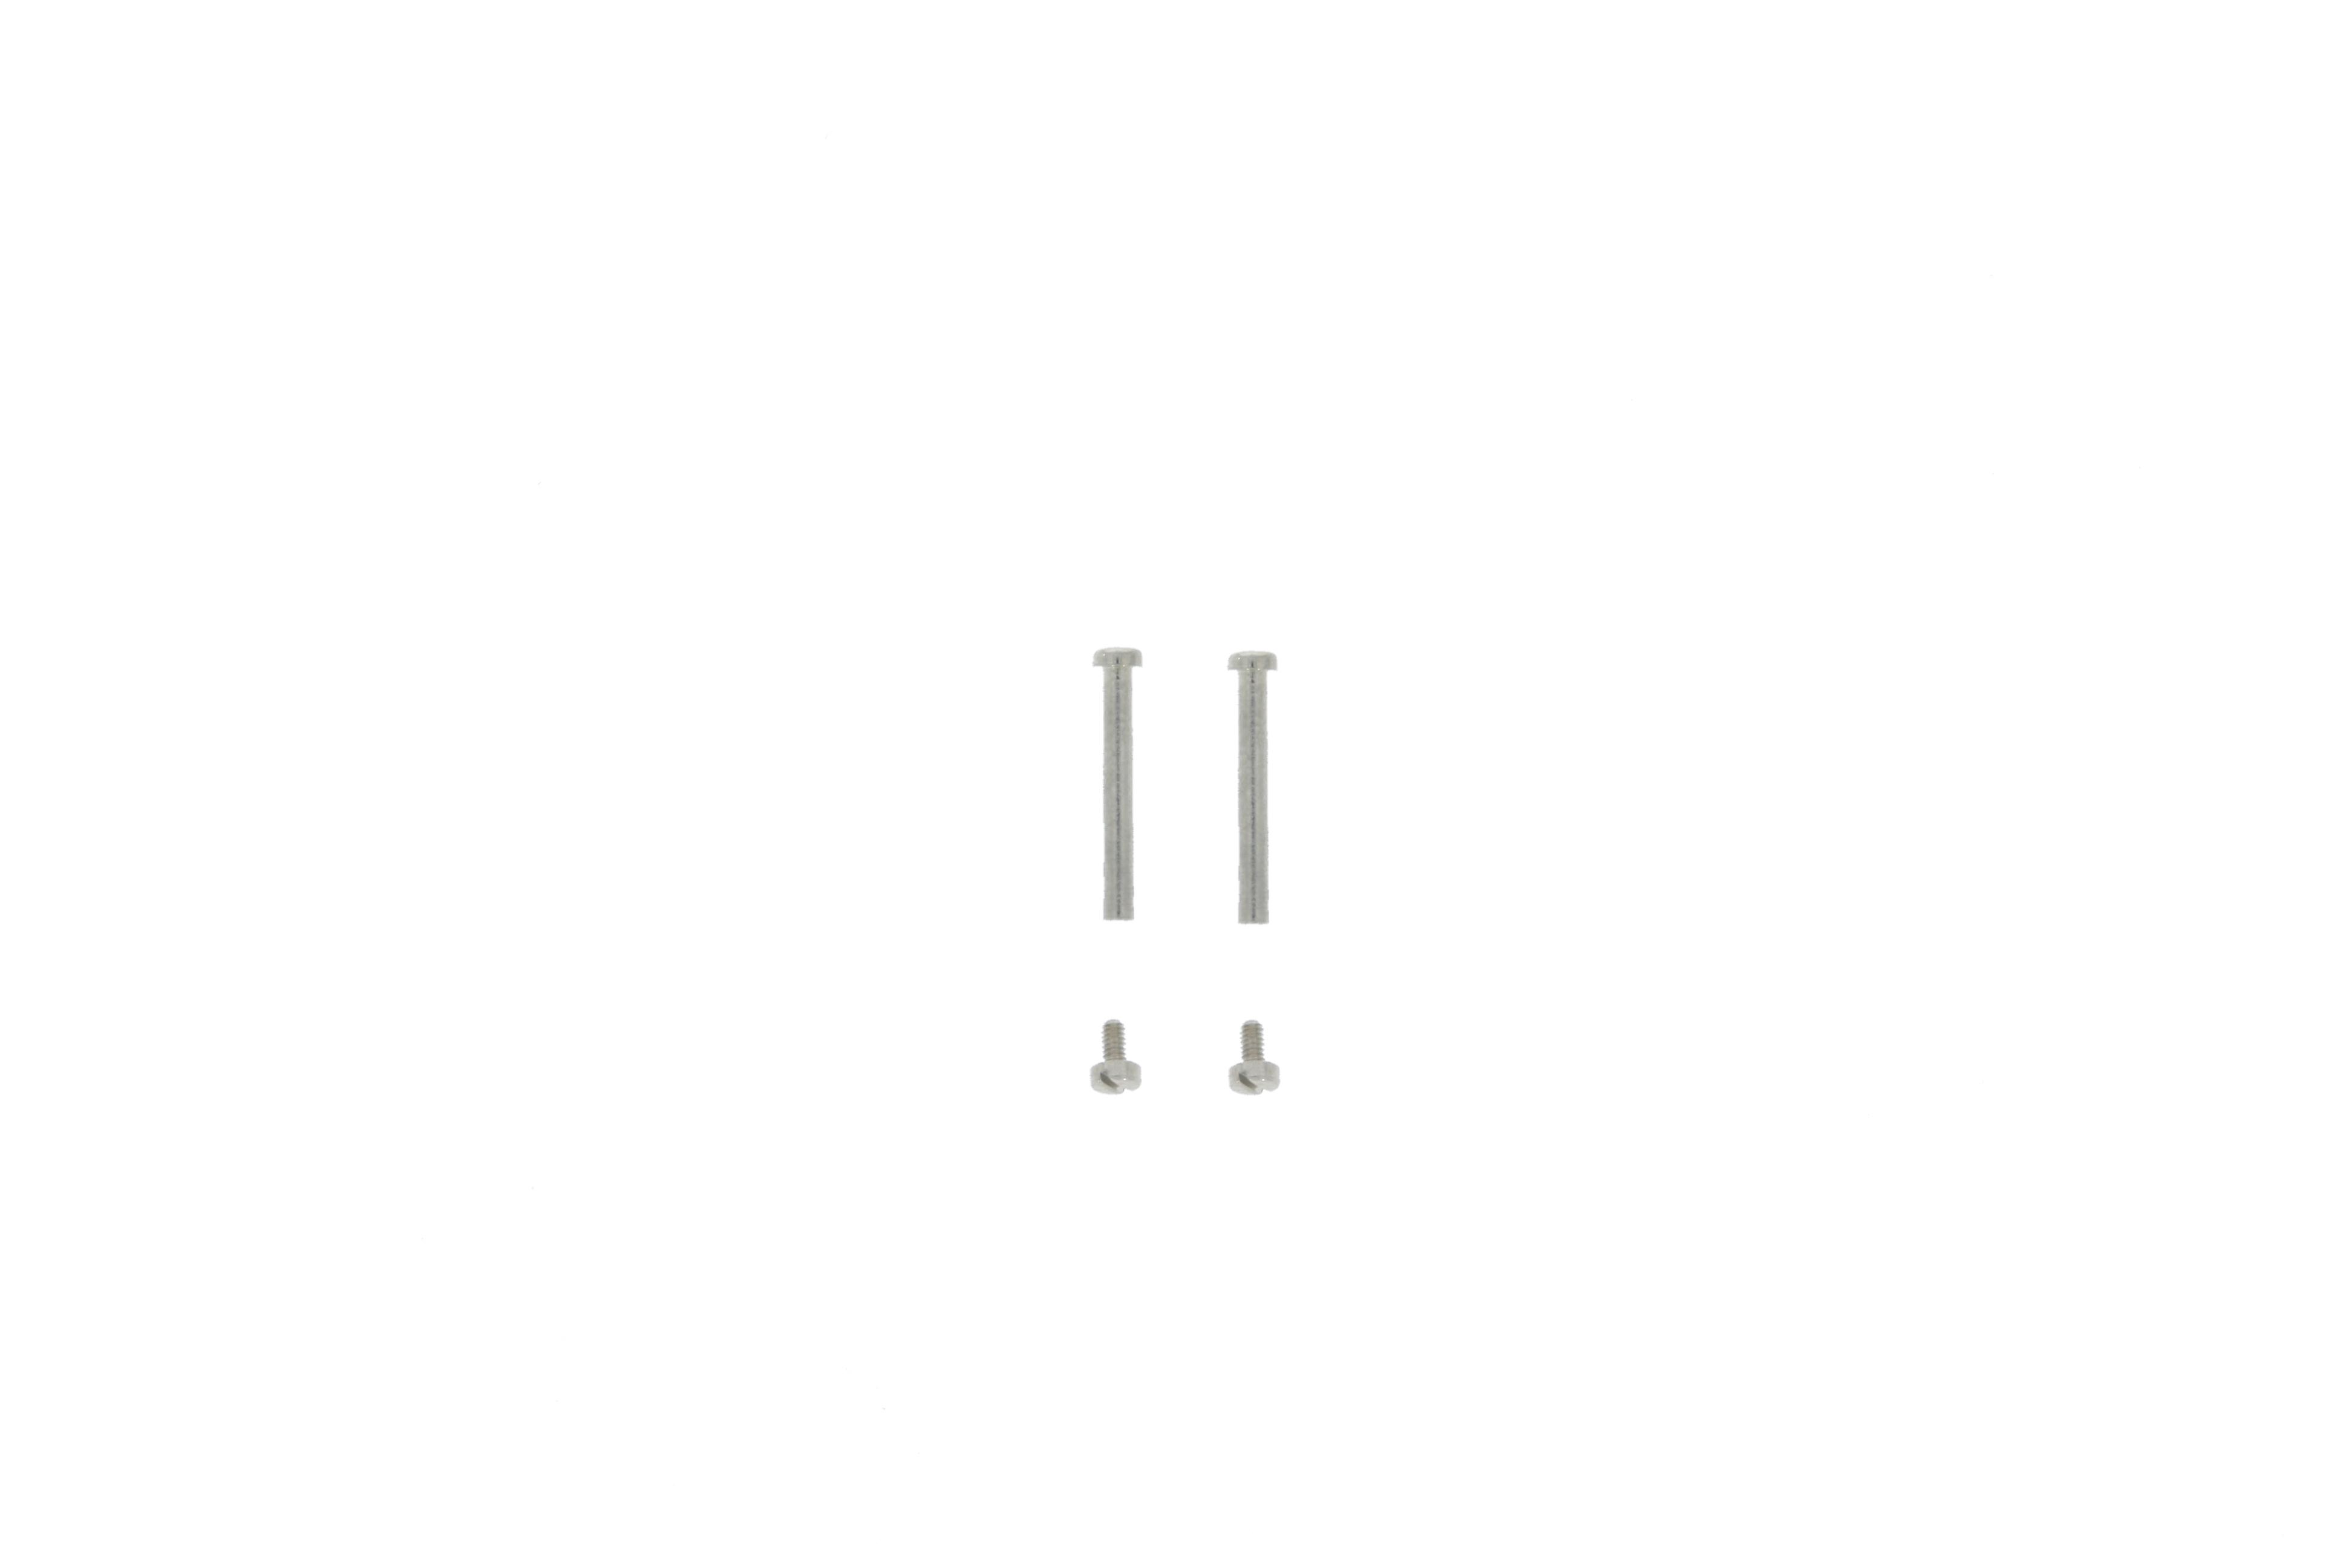 DKNY NY8834 Horlogeband/-kast Schroefpen (2 stuks)